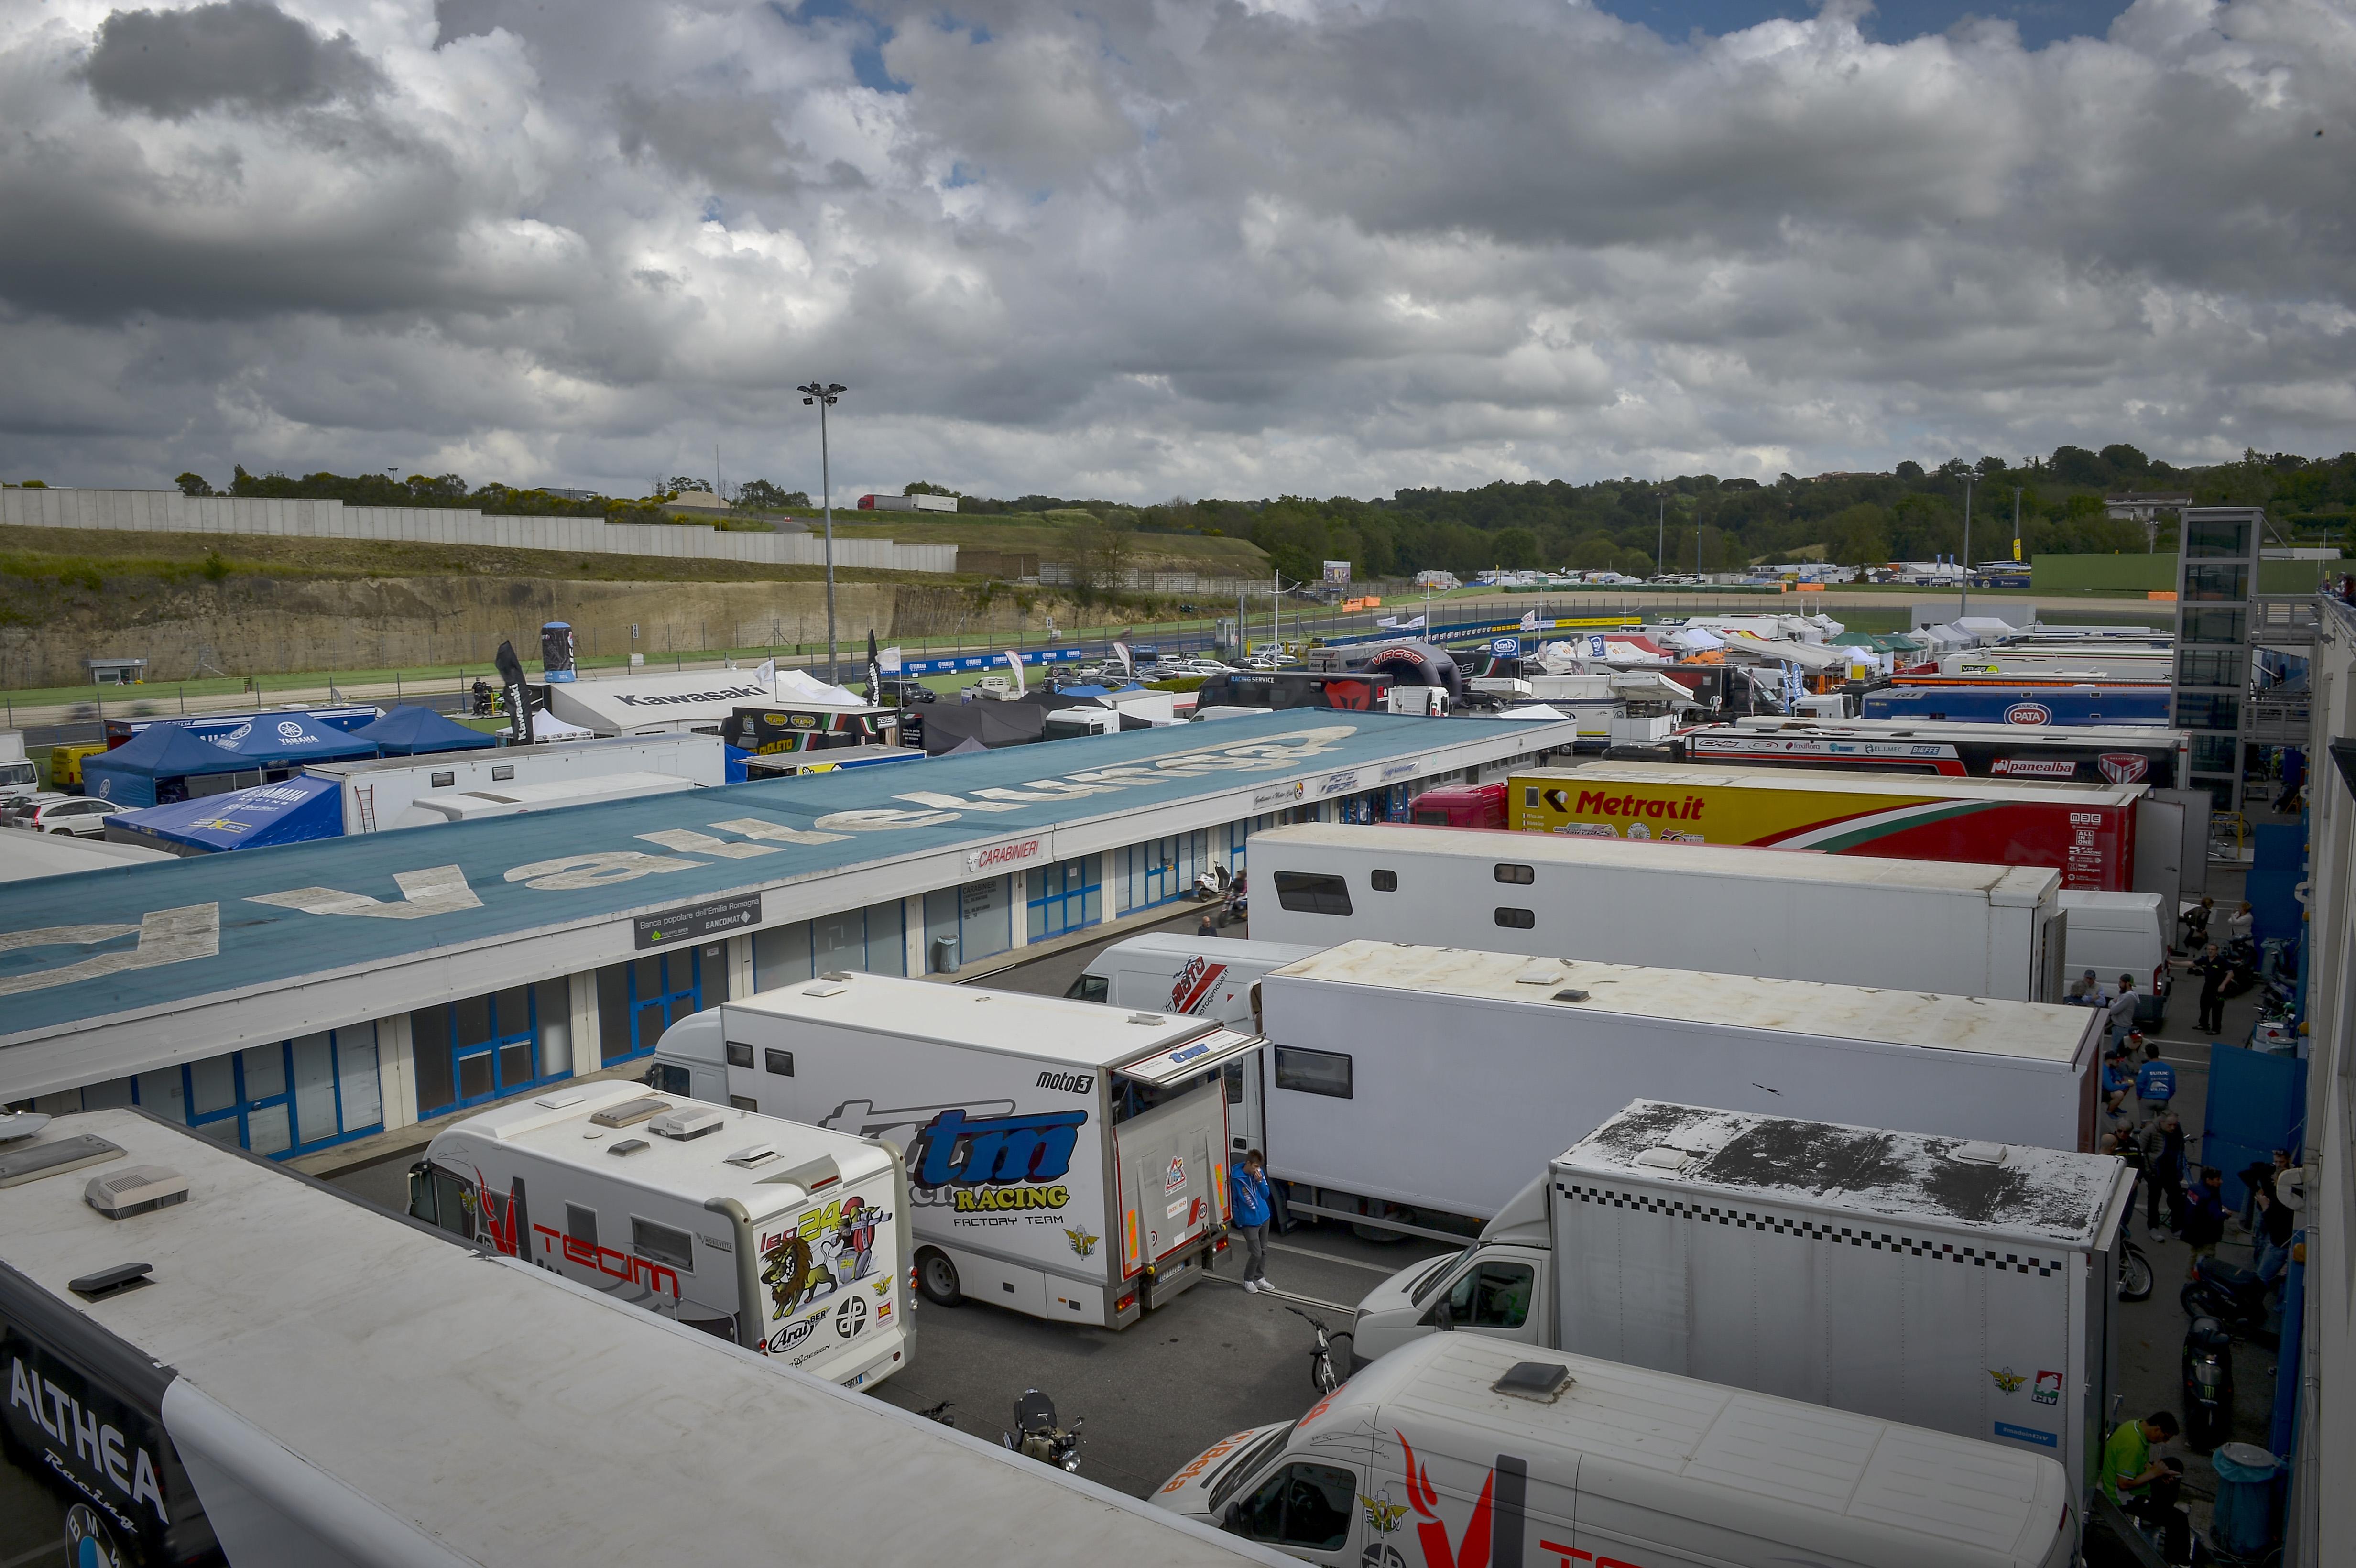 Circuito Vallelunga : Round vallelunga la sfida continua